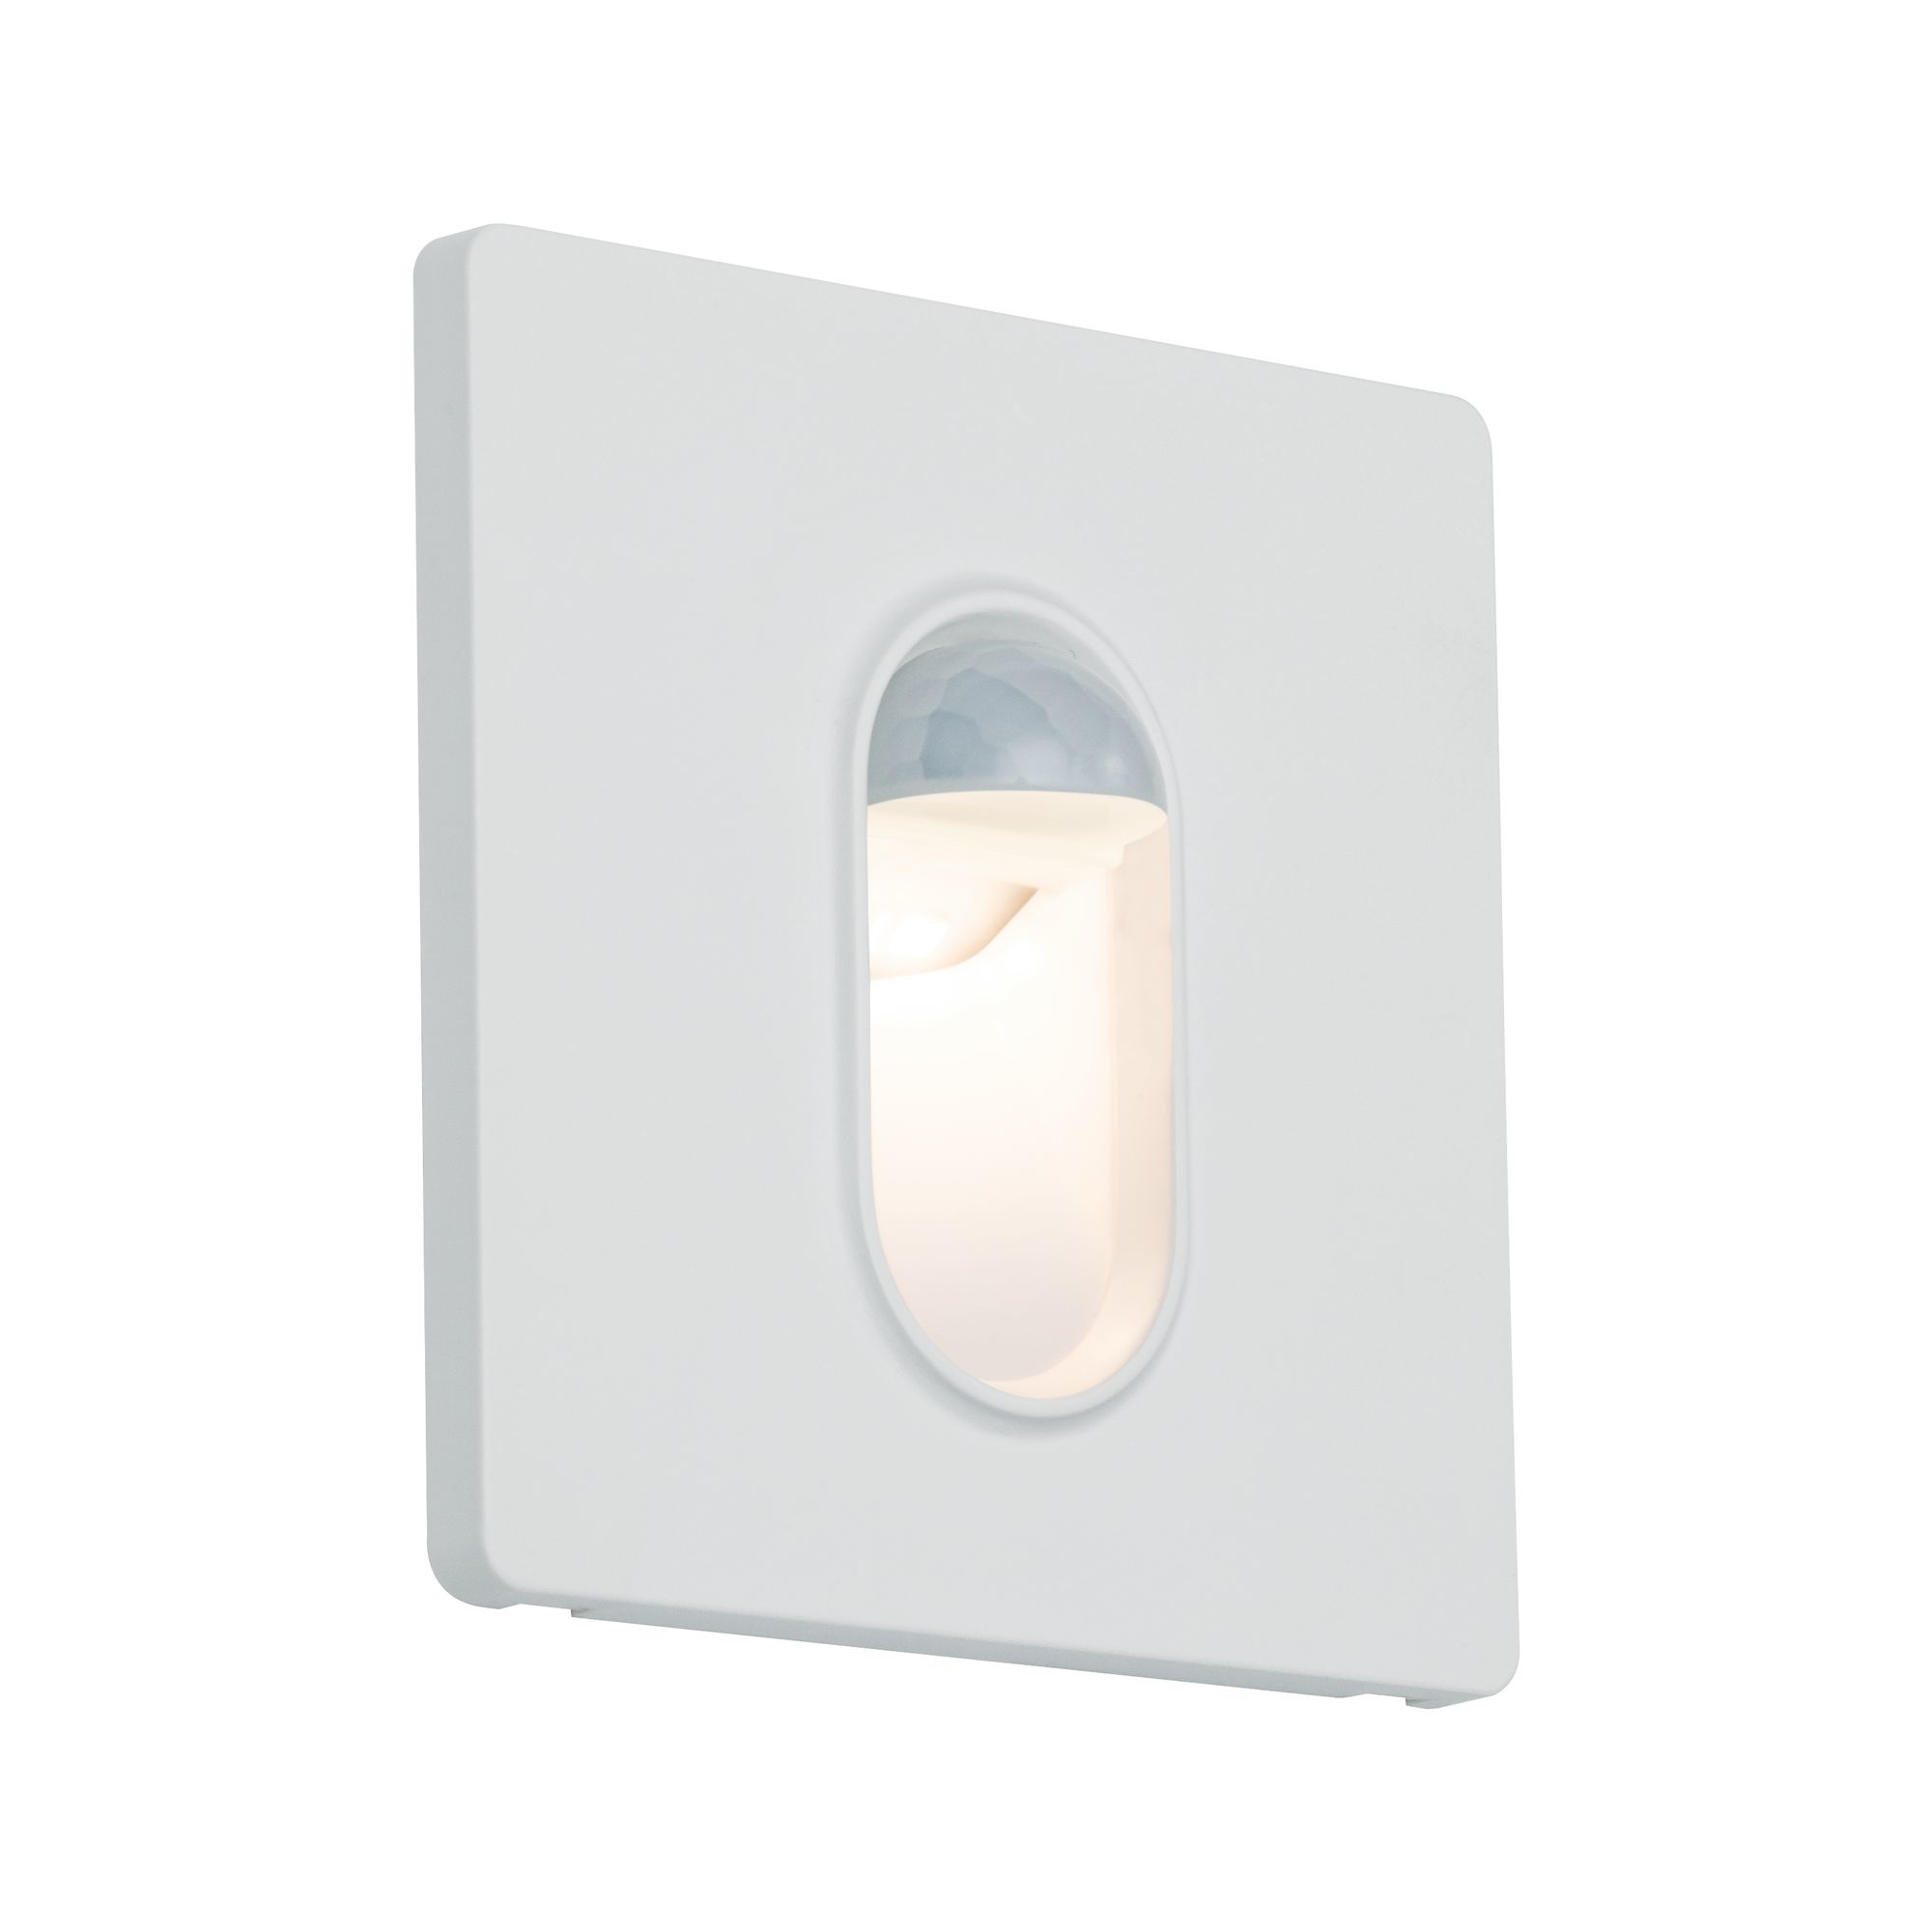 Paulmann Wand EBL Set Sensor eckig 1x2,7W 2700K230V Weiß/Kunststoff